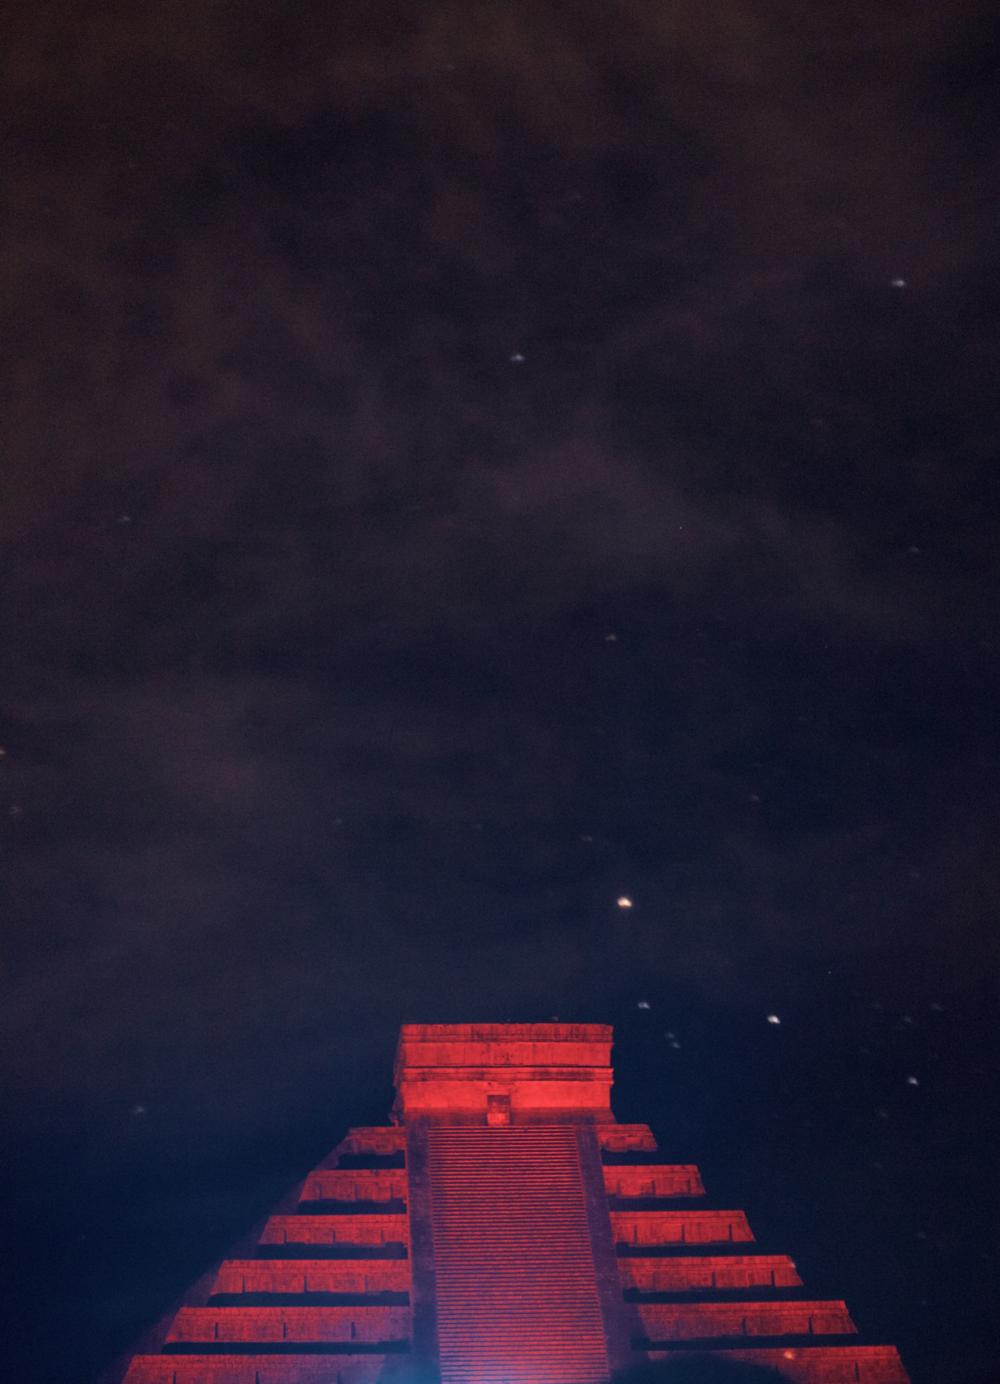 Chichen Itza under the stars at night - lit up red.